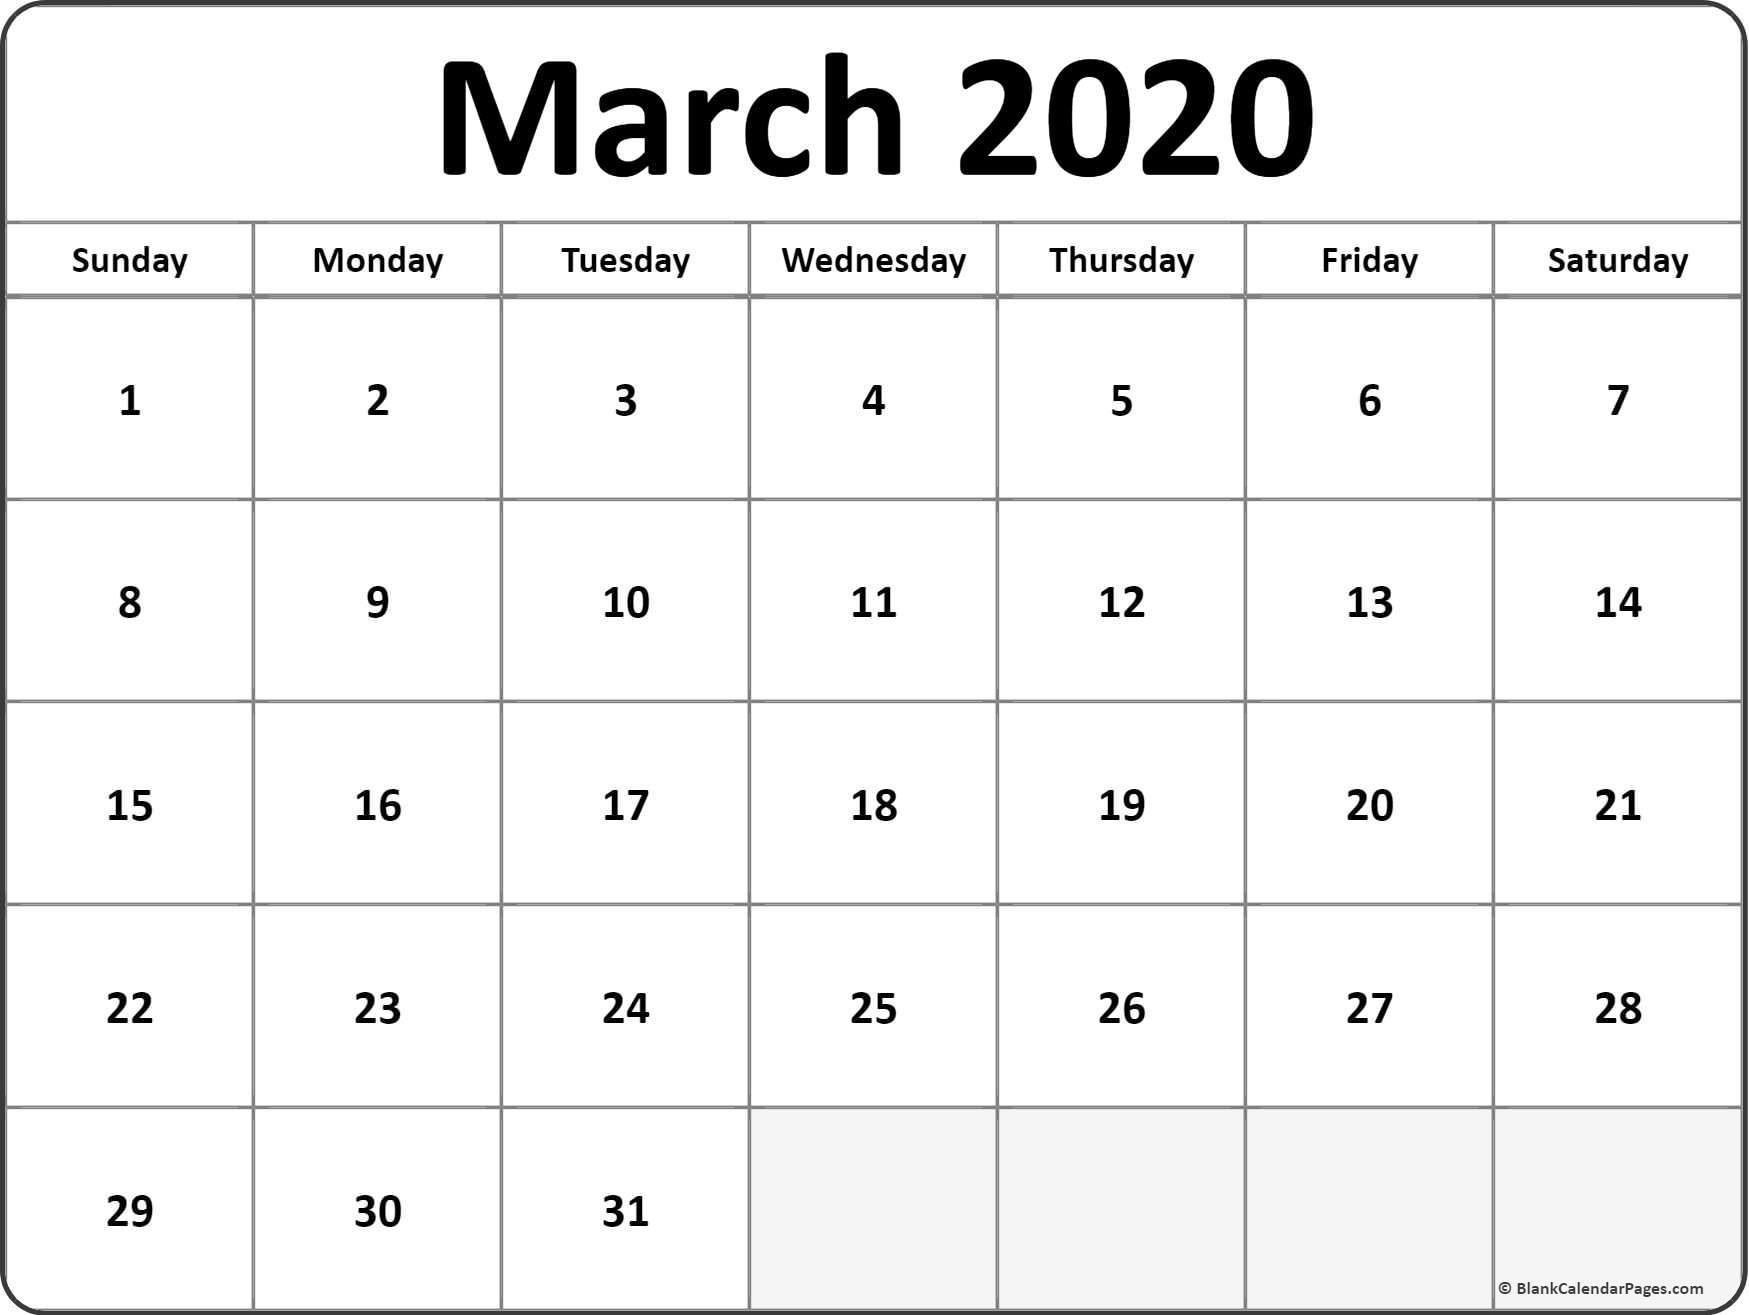 March 2020 blank calendar templates